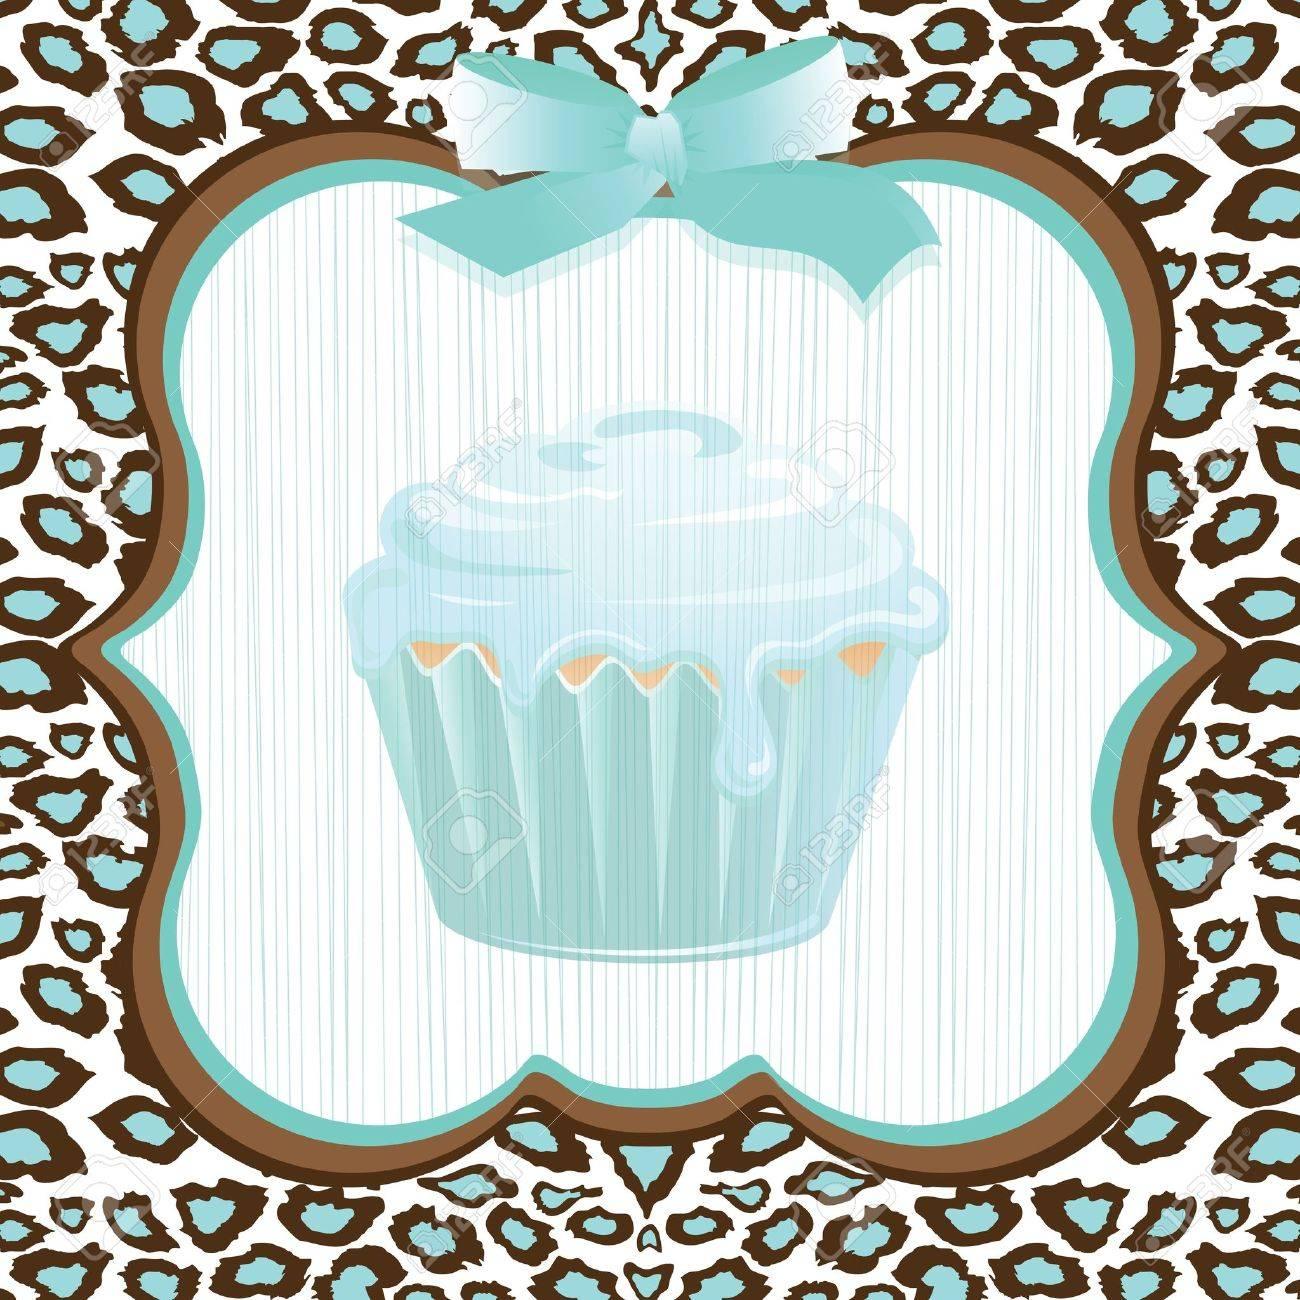 Aqua Leopard Print Cupcake Birthday Party Invitation Royalty Free ...